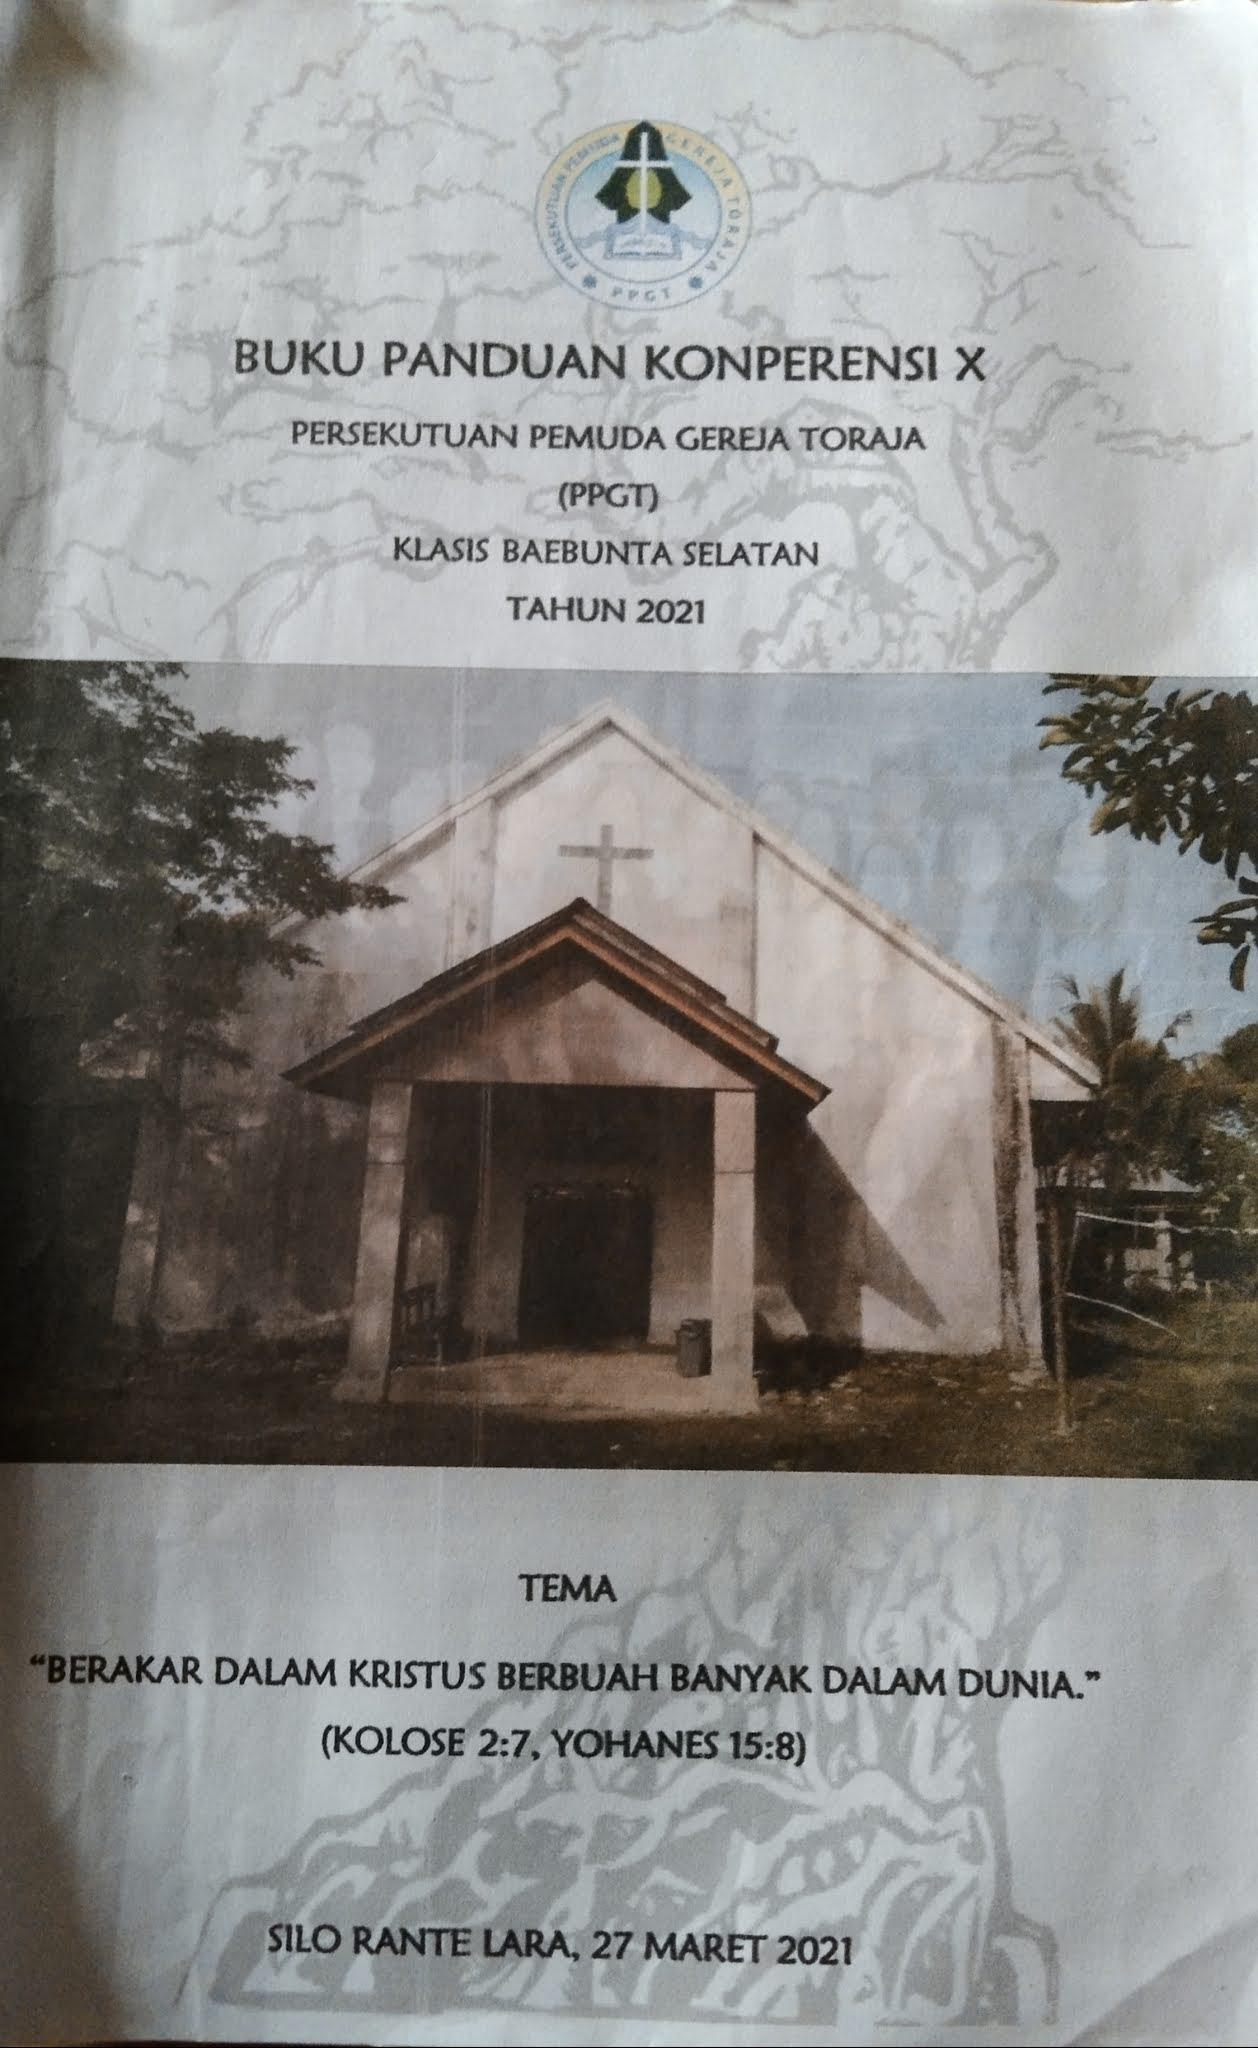 Sampul Buku Panduan Konperensi PPGT